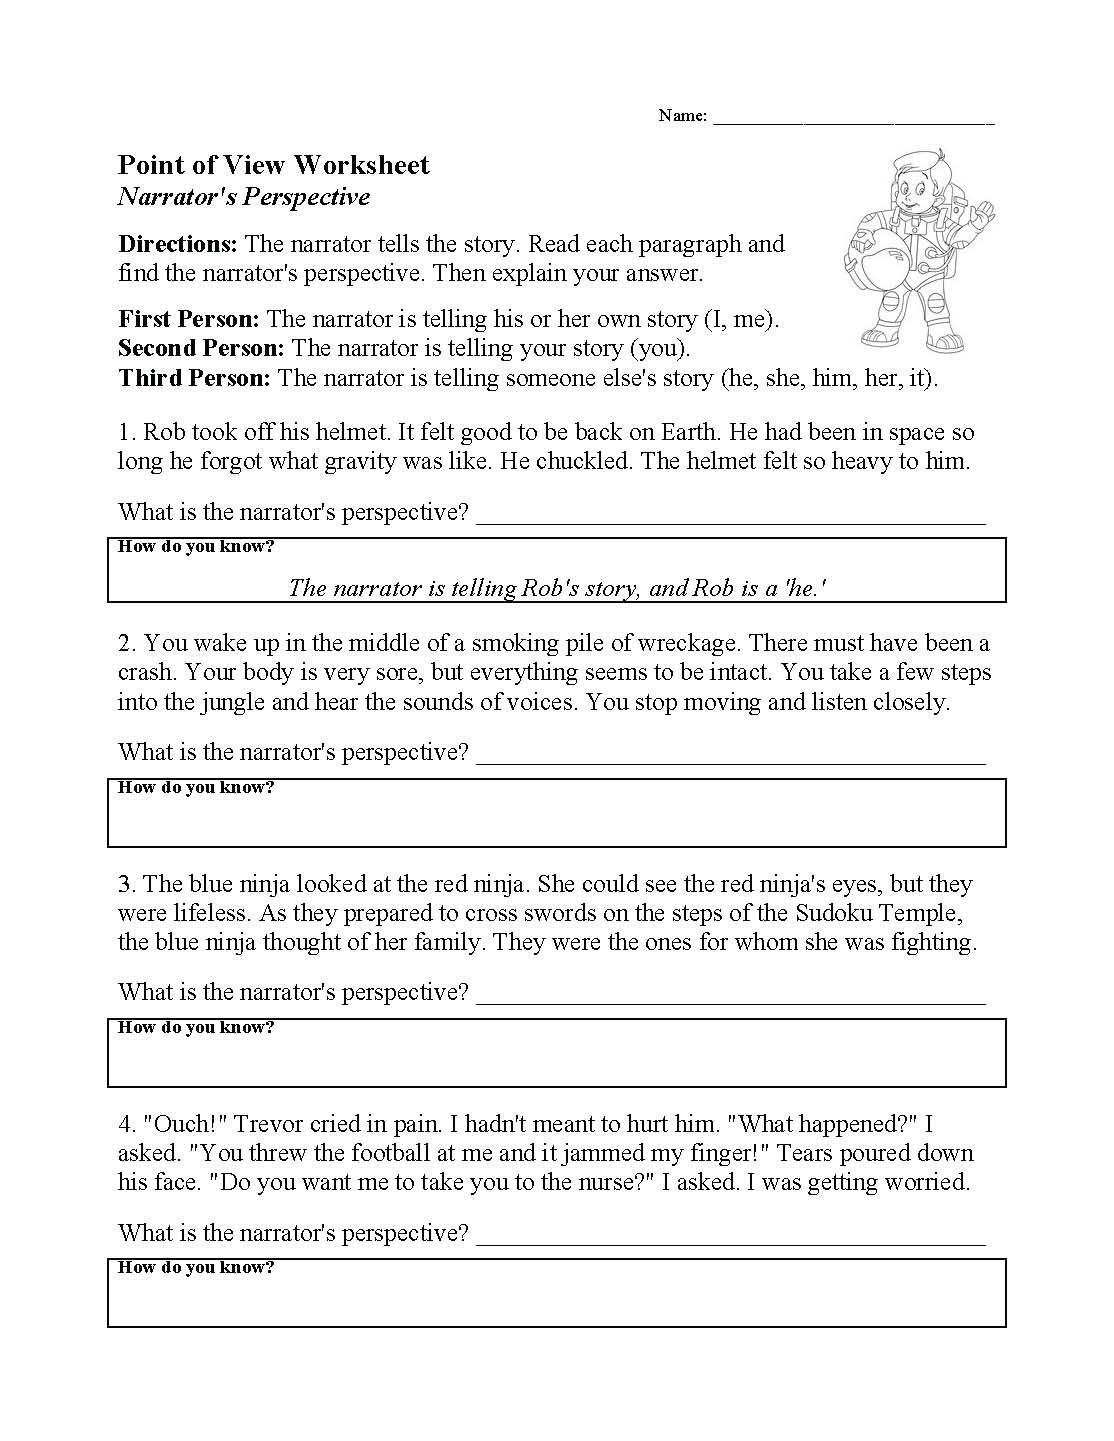 Elements Of Fiction Worksheet